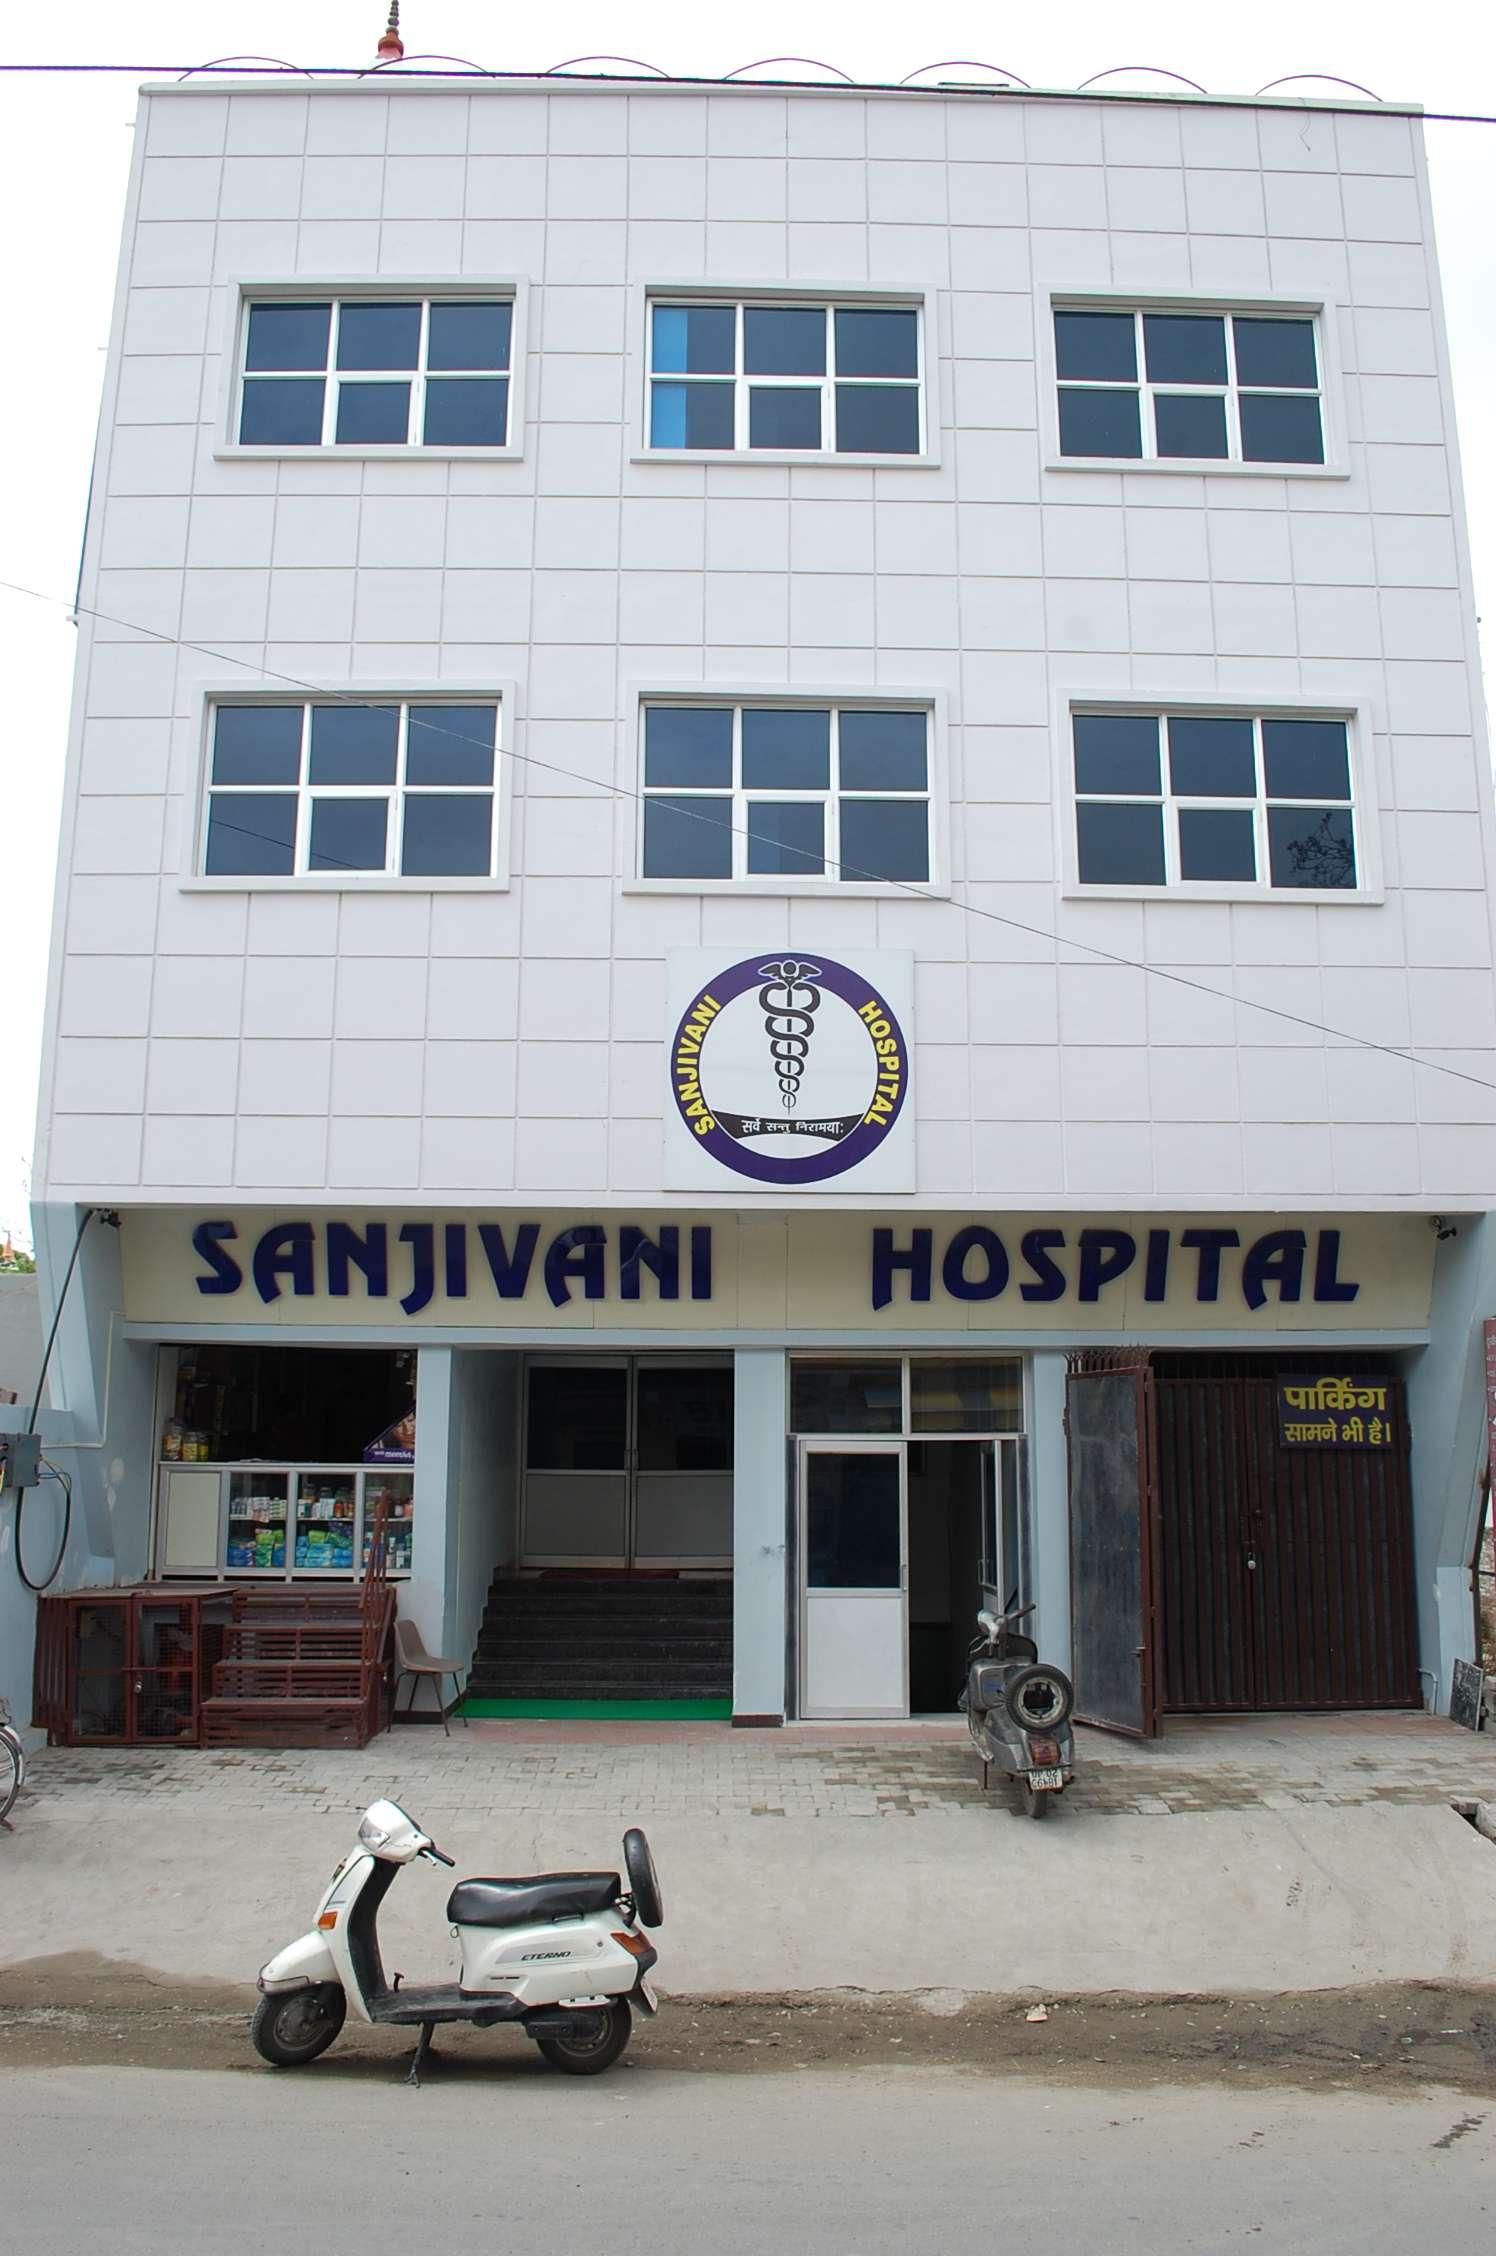 Sanjivani Hospital in haldwani